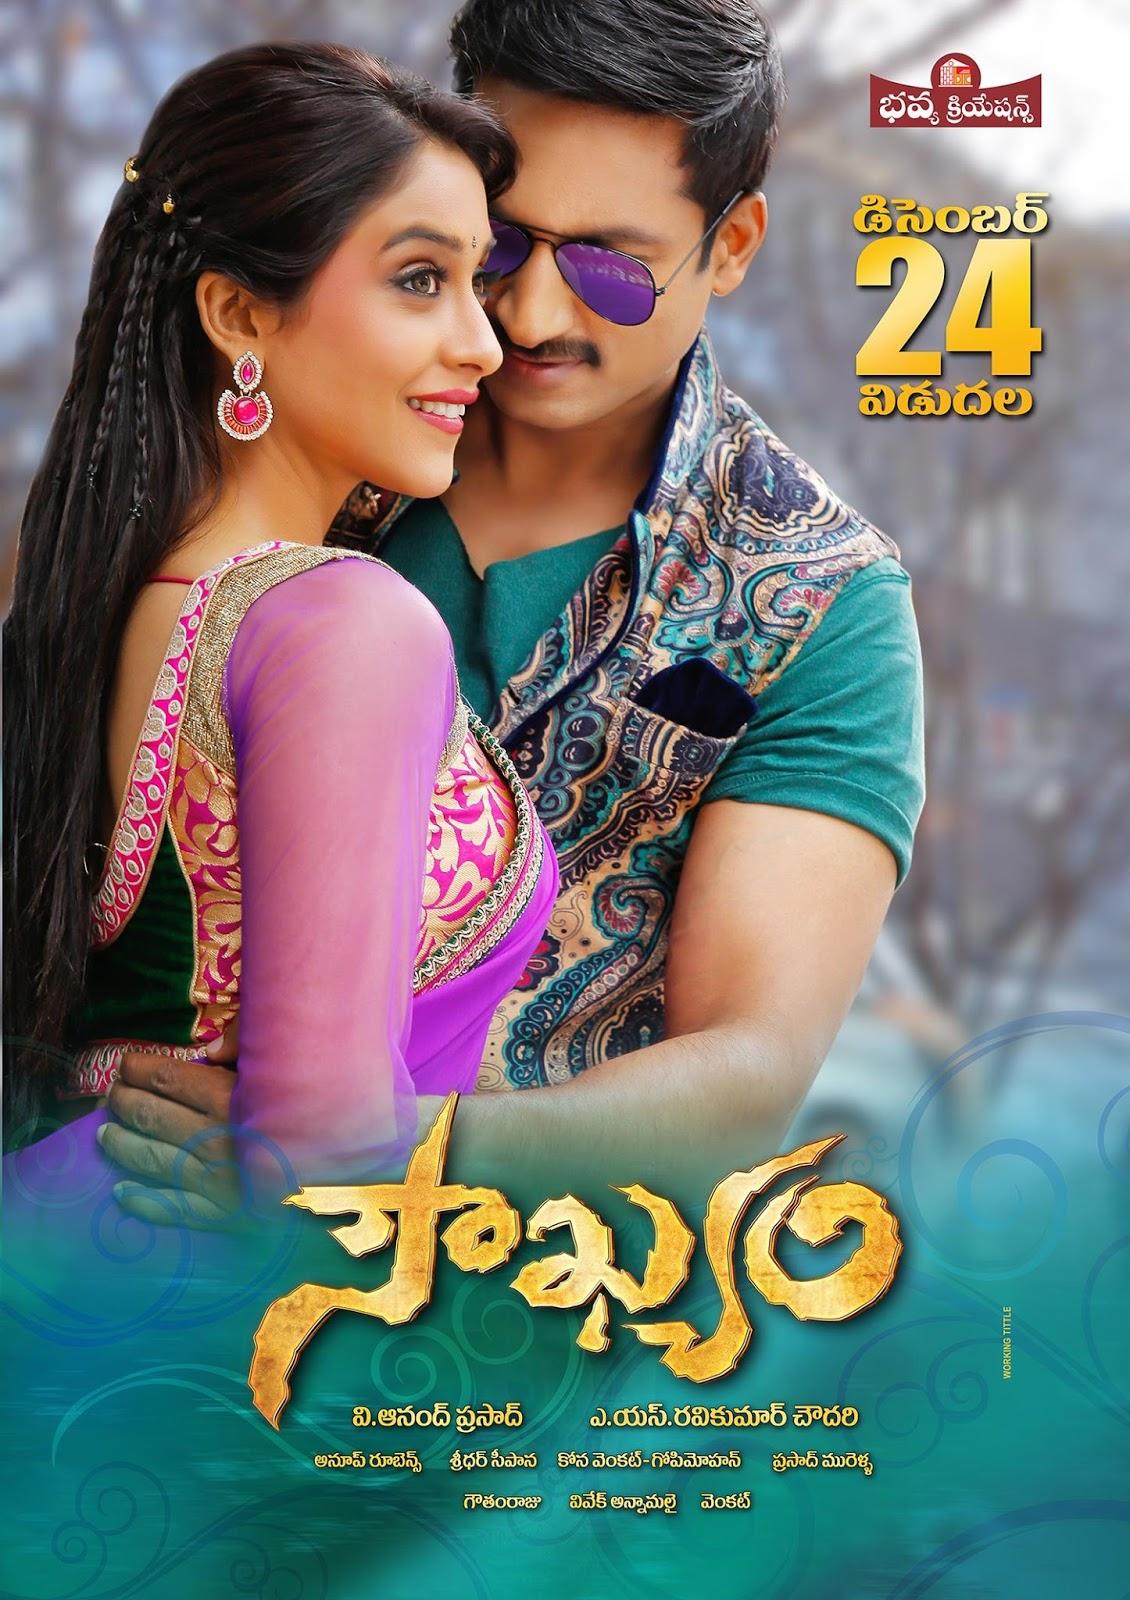 Watch Soukhyam (2015) DVDScr Telugu Full Movie Watch Online Free Download